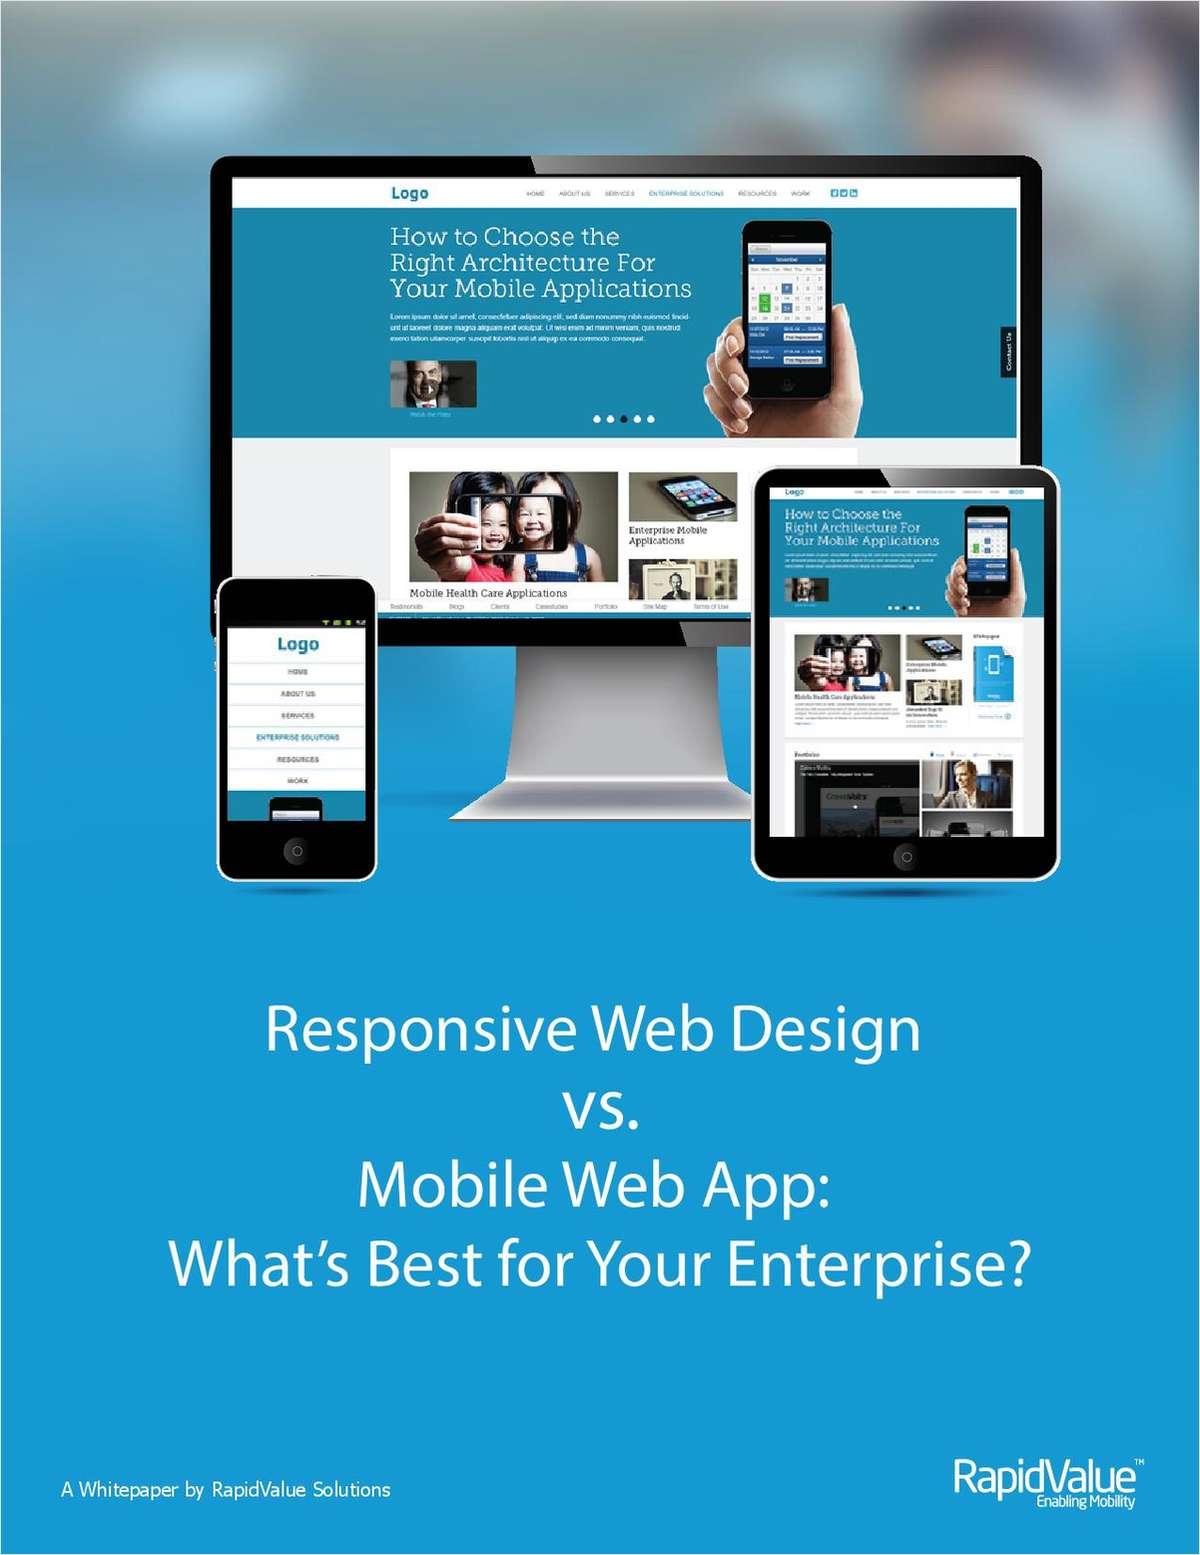 Responsive Web Design vs. Mobile Web App:  What's Best for Your Enterprise?